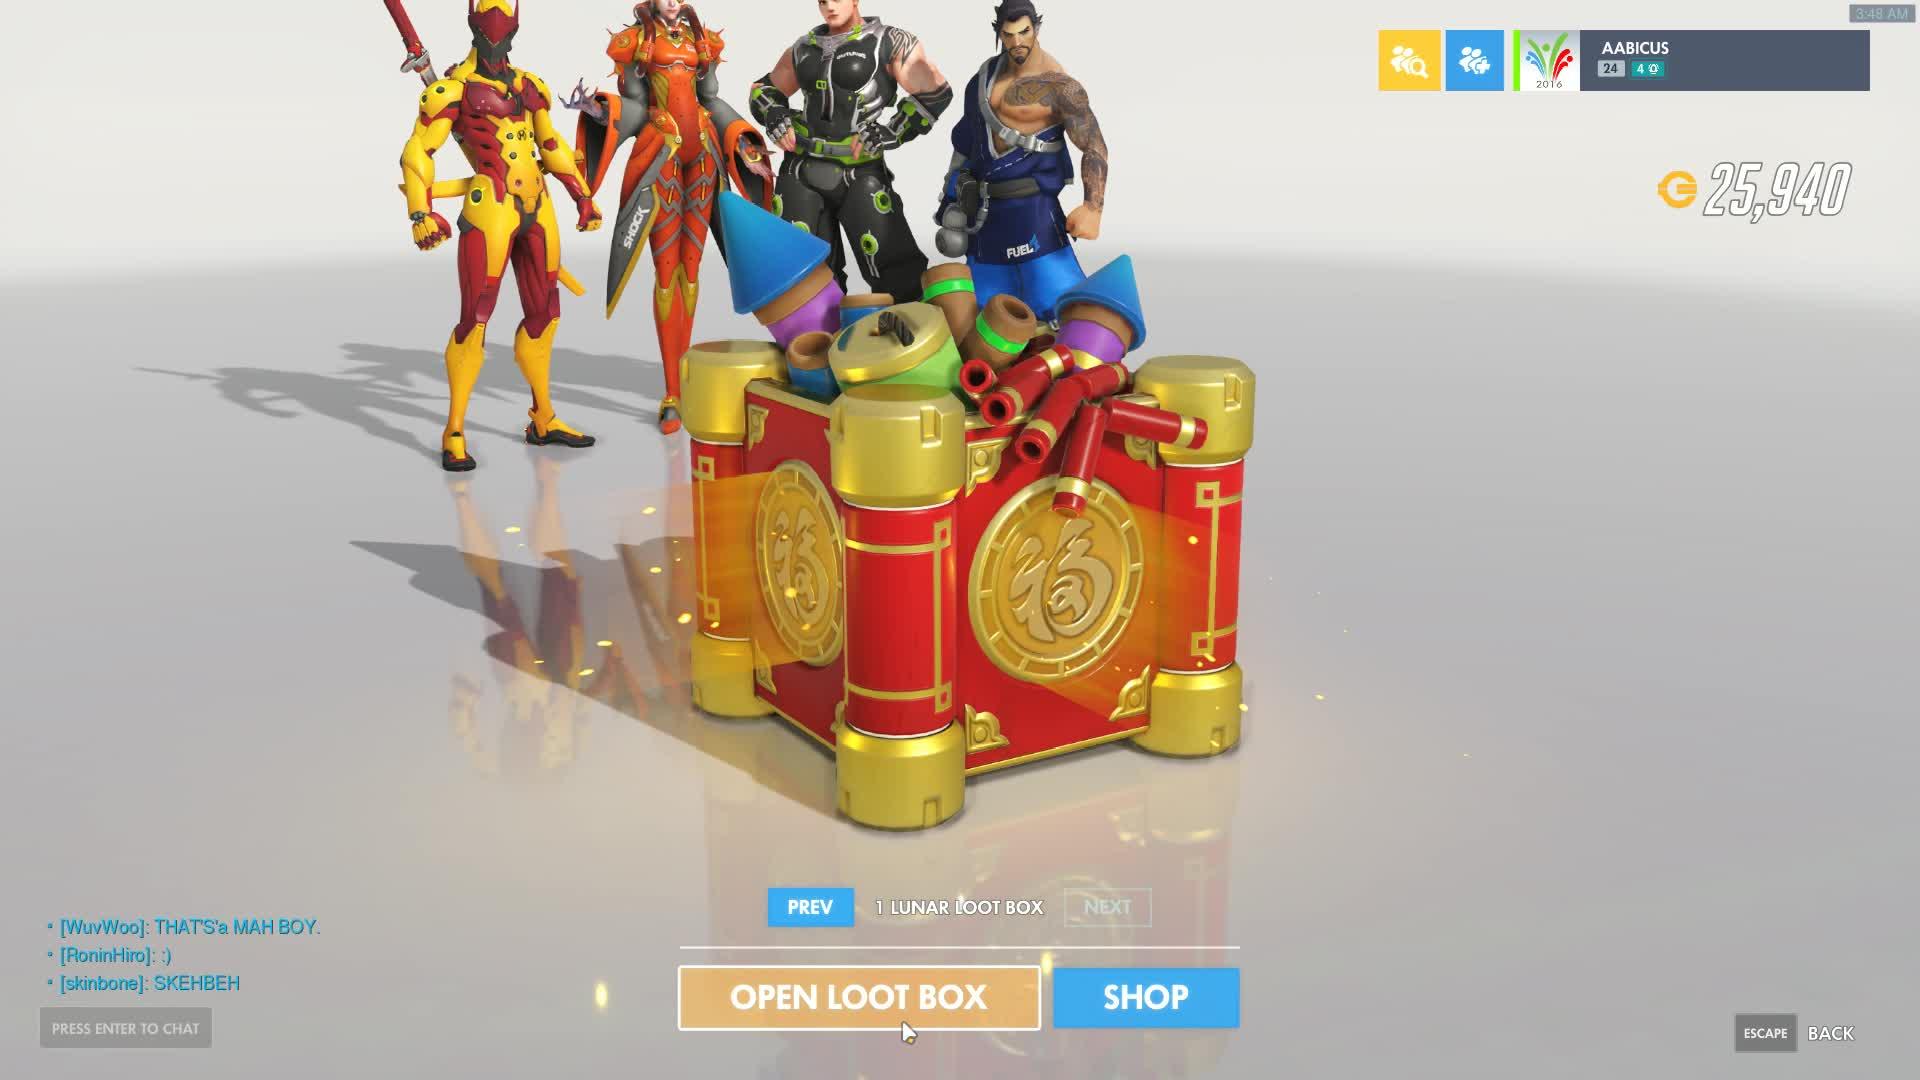 glitch, loot box, overwatch, overwatch glitch, Overwatch Loot Box glitch GIFs